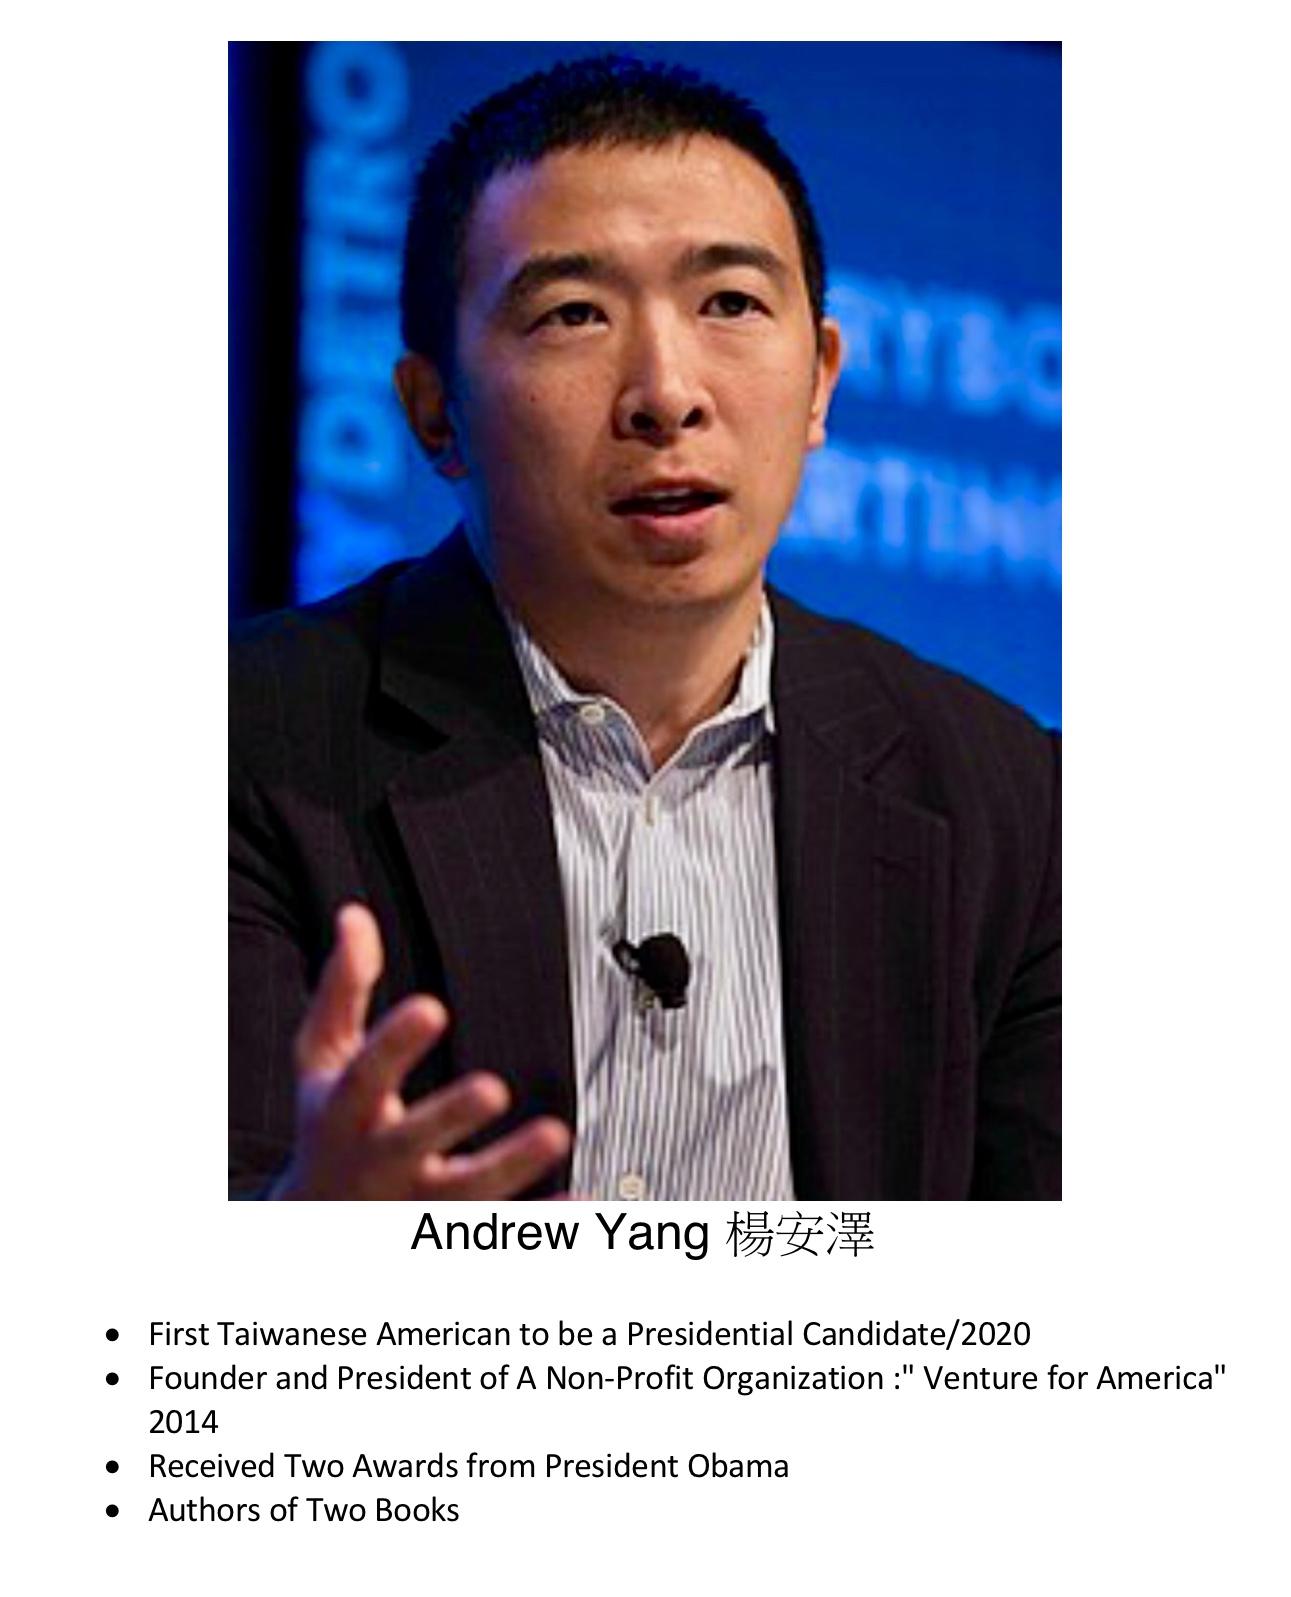 219. Andrew Yang 楊安澤